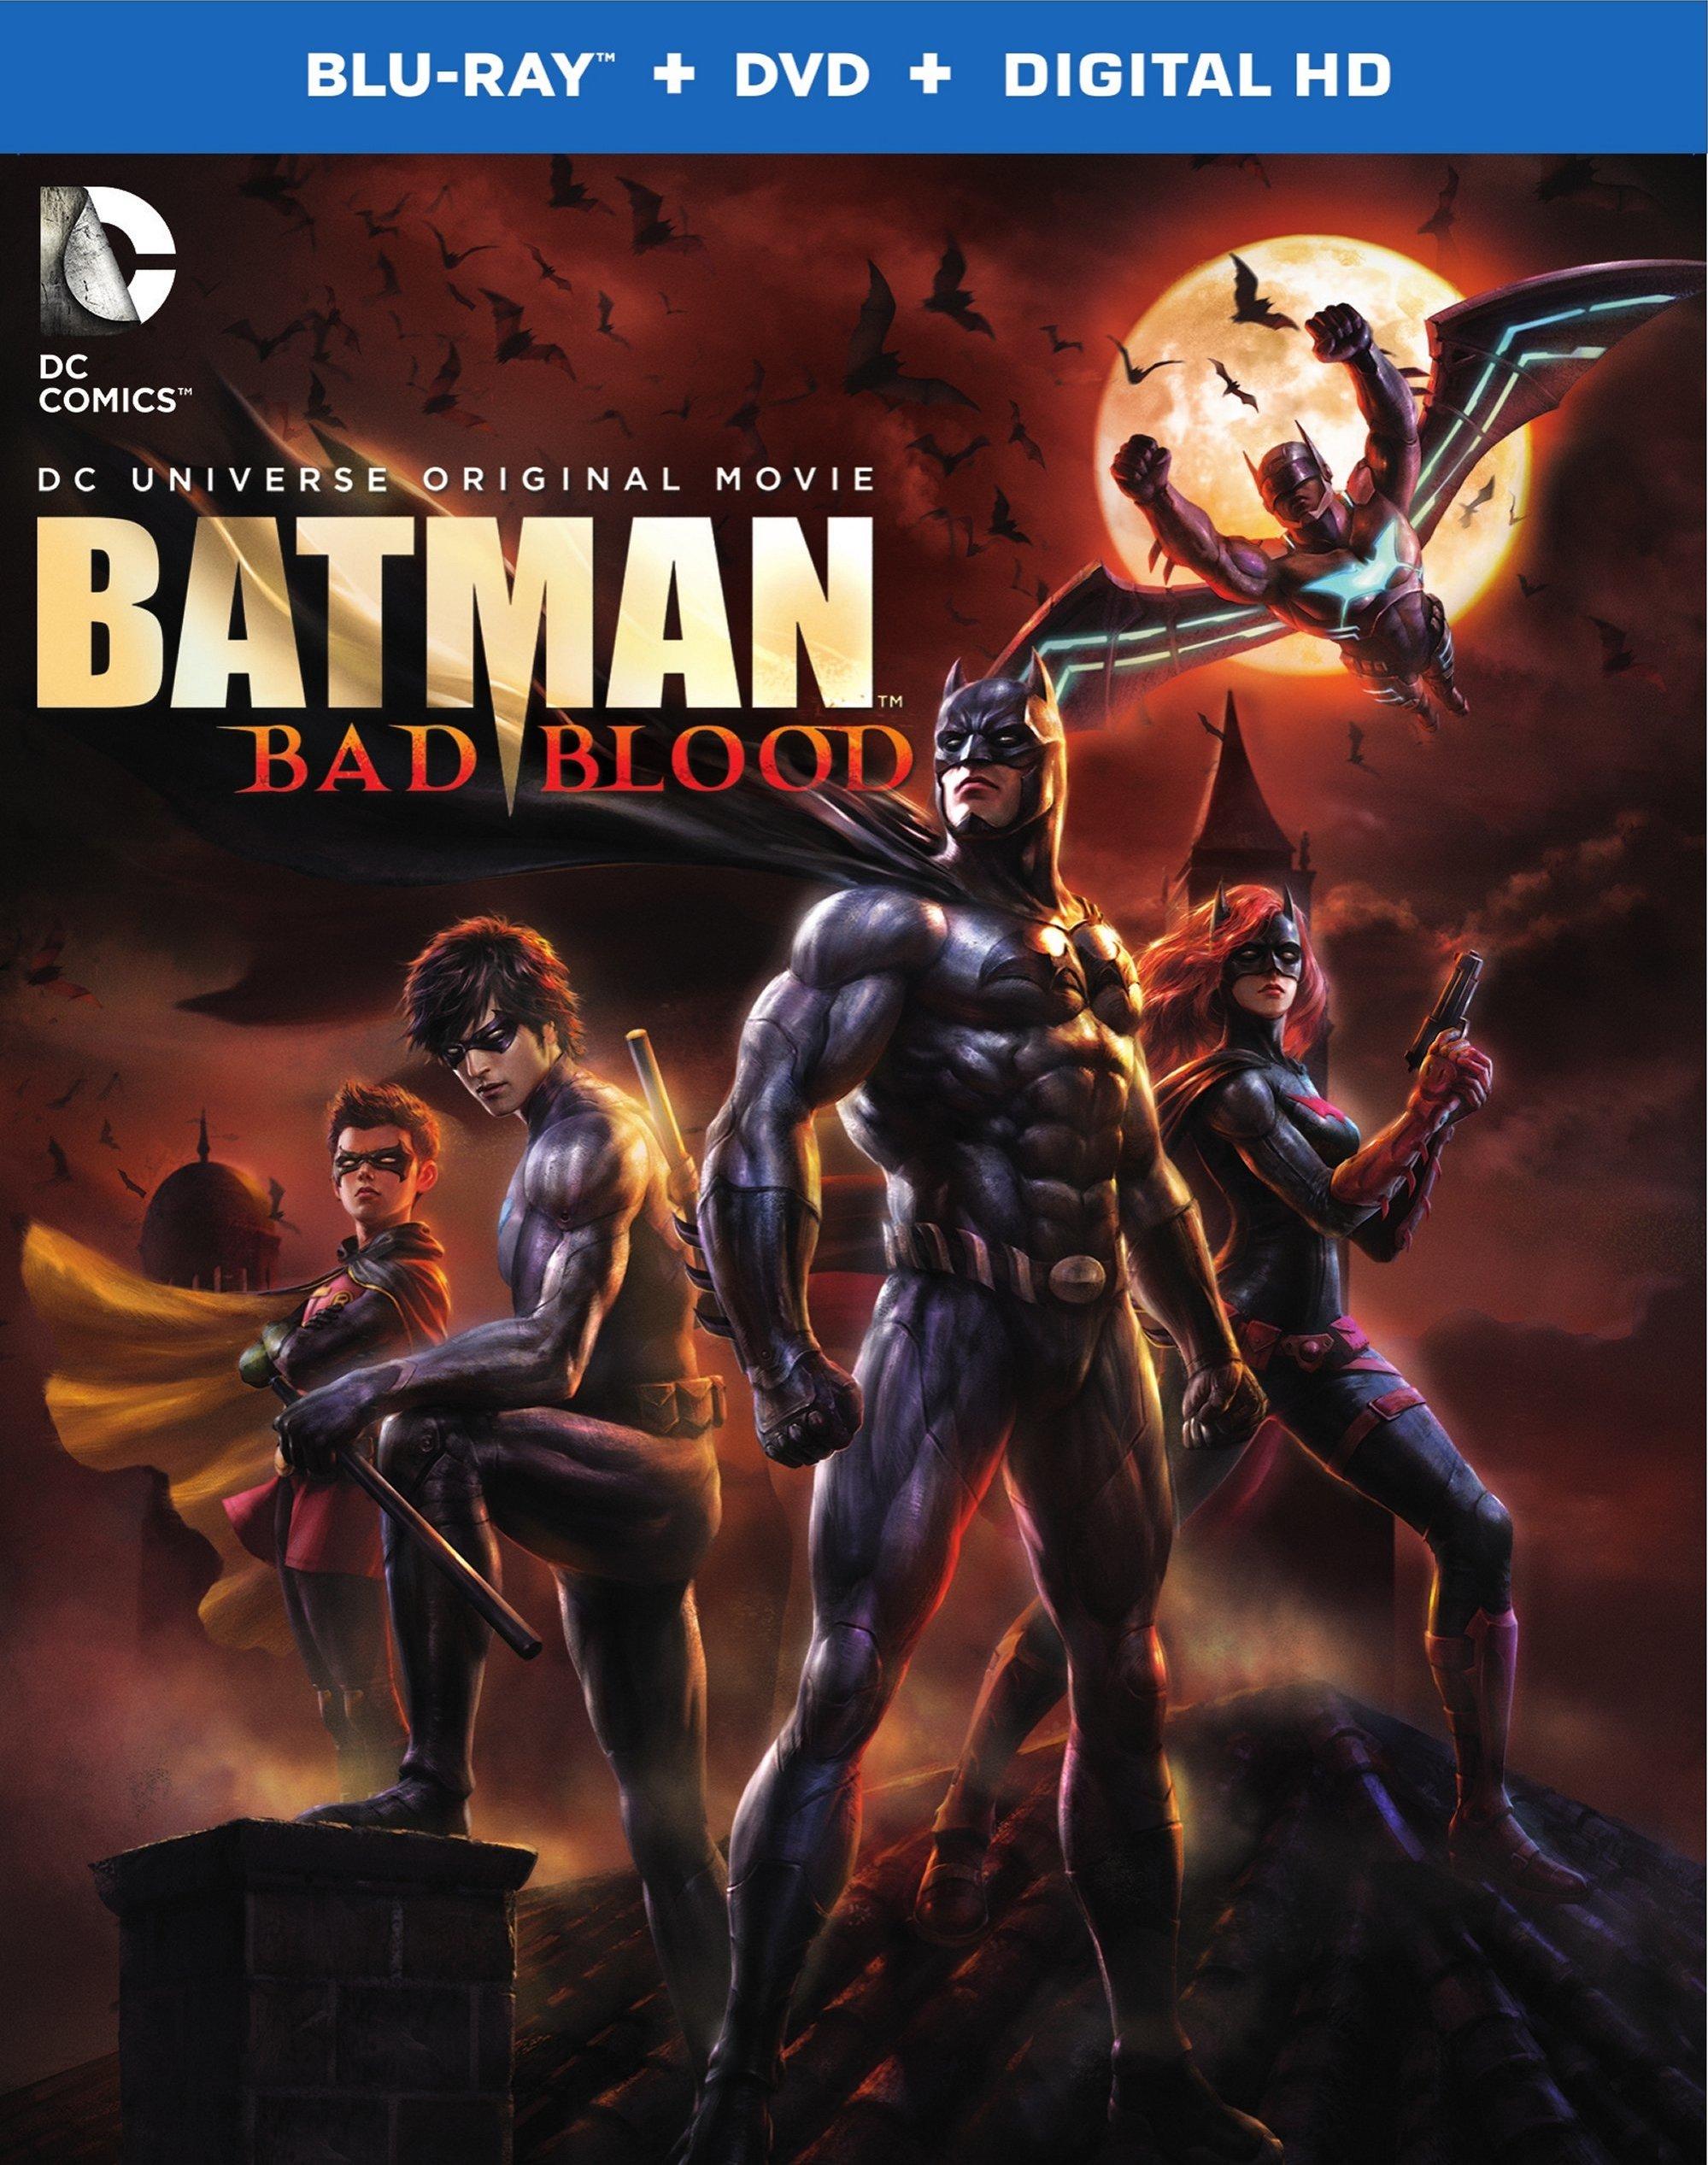 Batman: Bad Blood (2016) Blu-ray